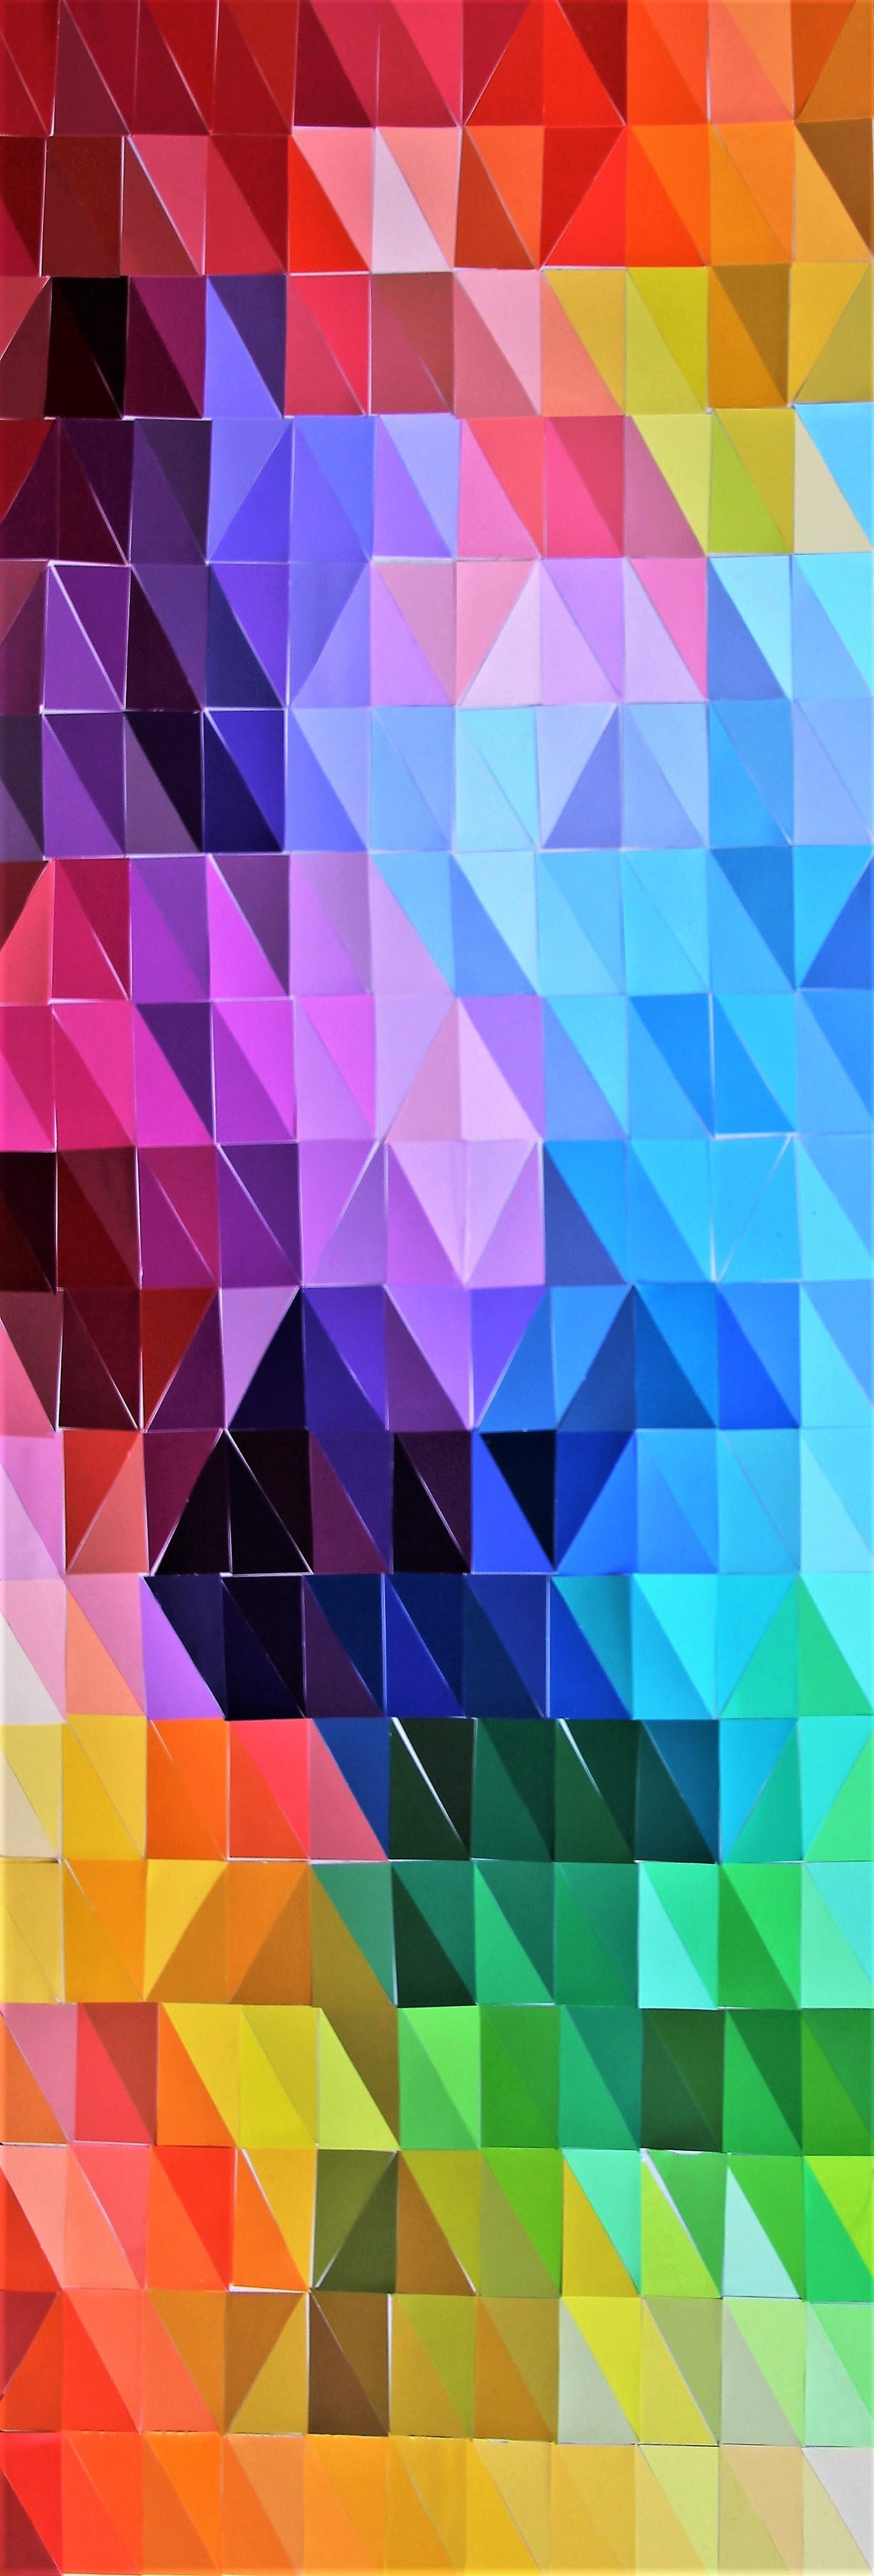 20496922-AsisaMadian_Escalators in rainbowcity_mixedmedia_12,2x35,43_1275.jpg